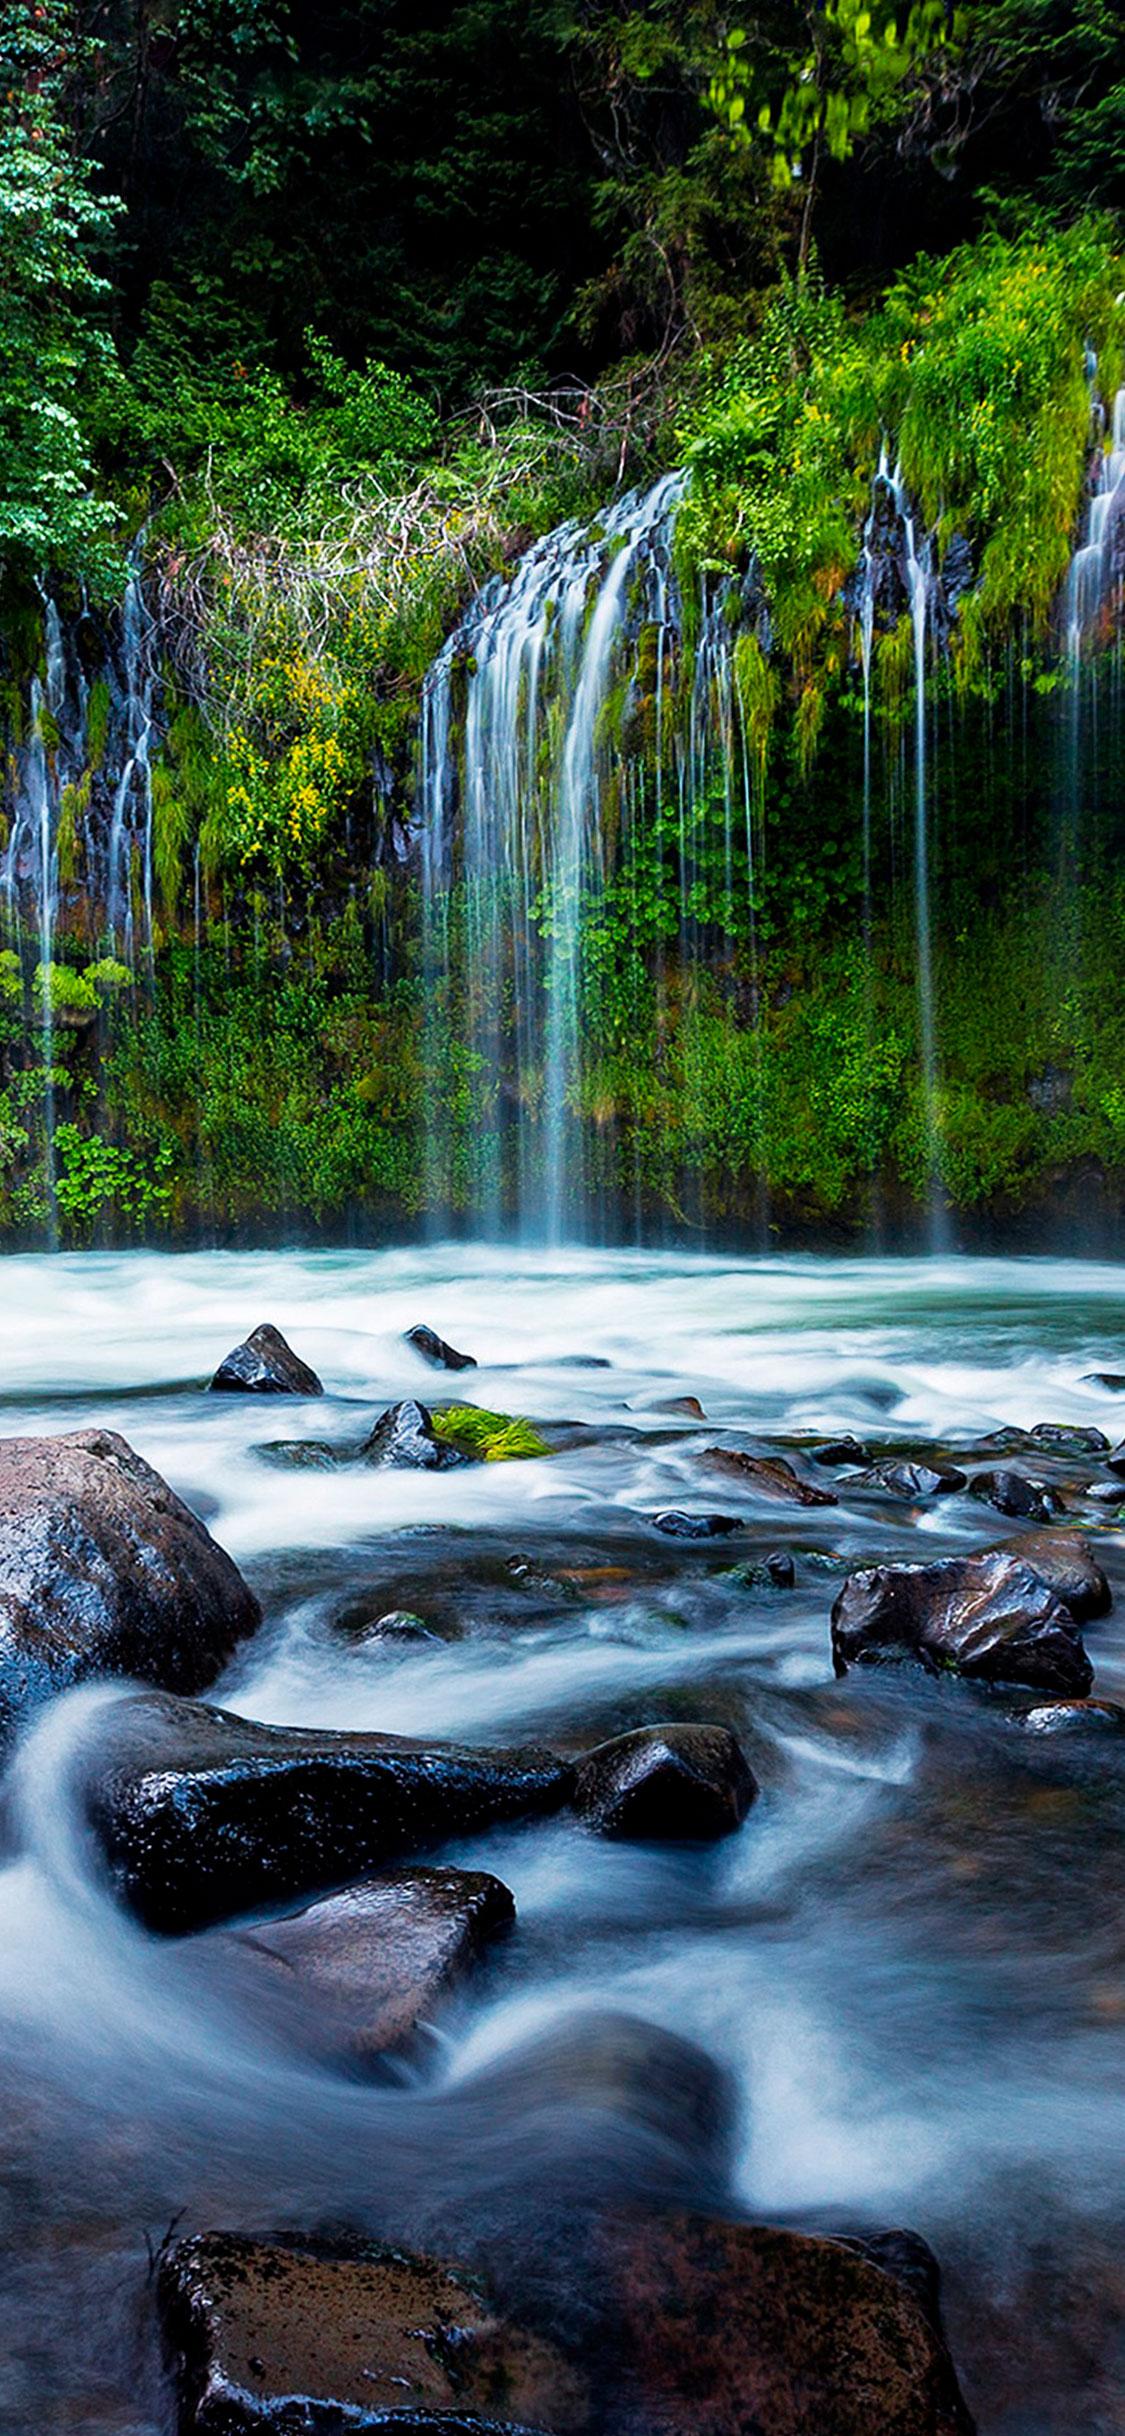 iPhone wallpaper waterfall3 Waterfall